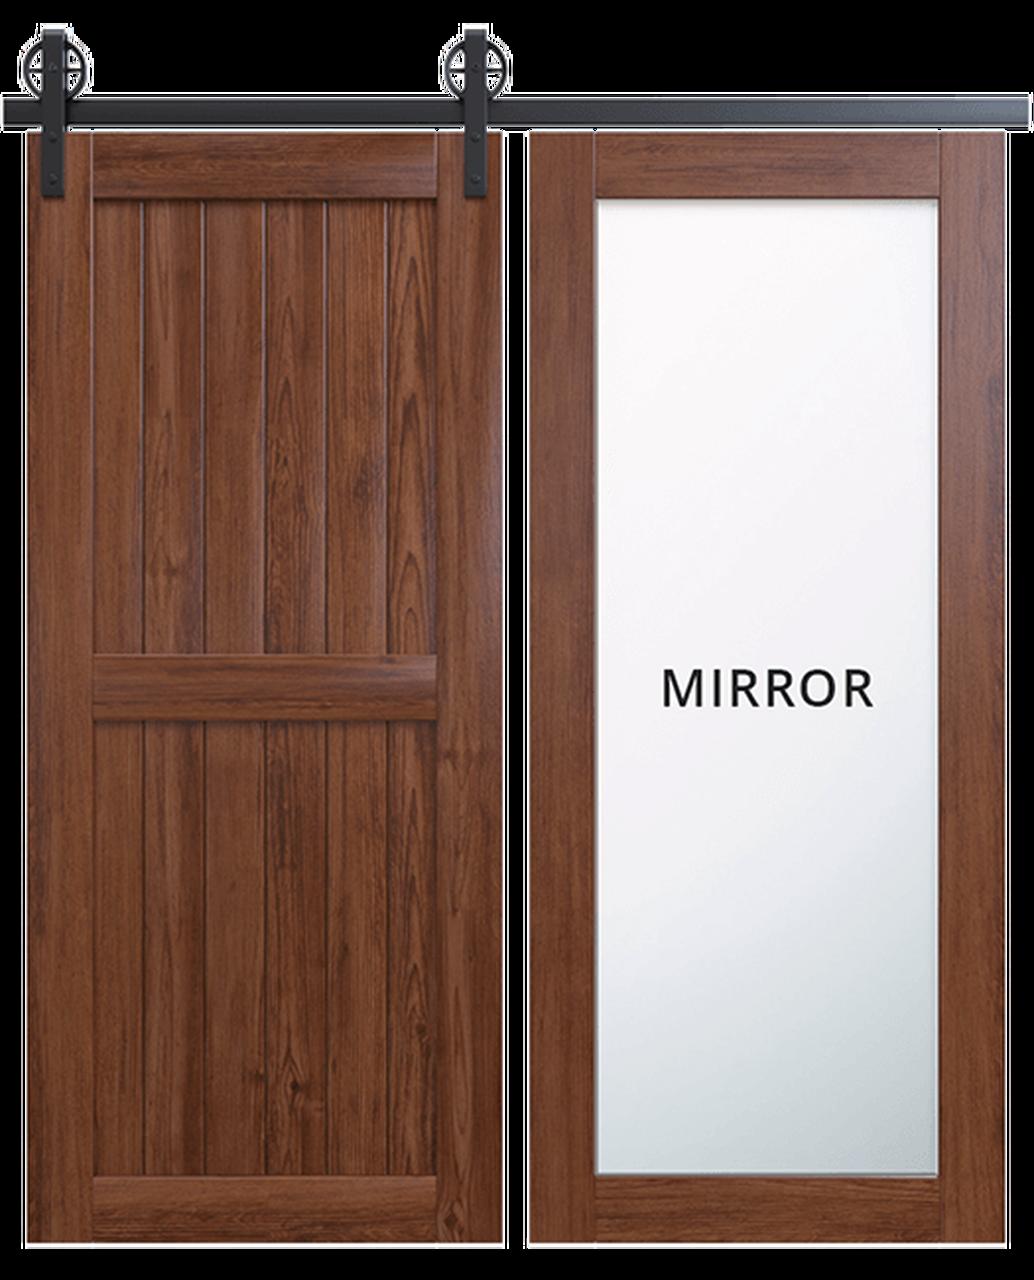 naples dark stained wood 2 panel barn door with full pane mirror